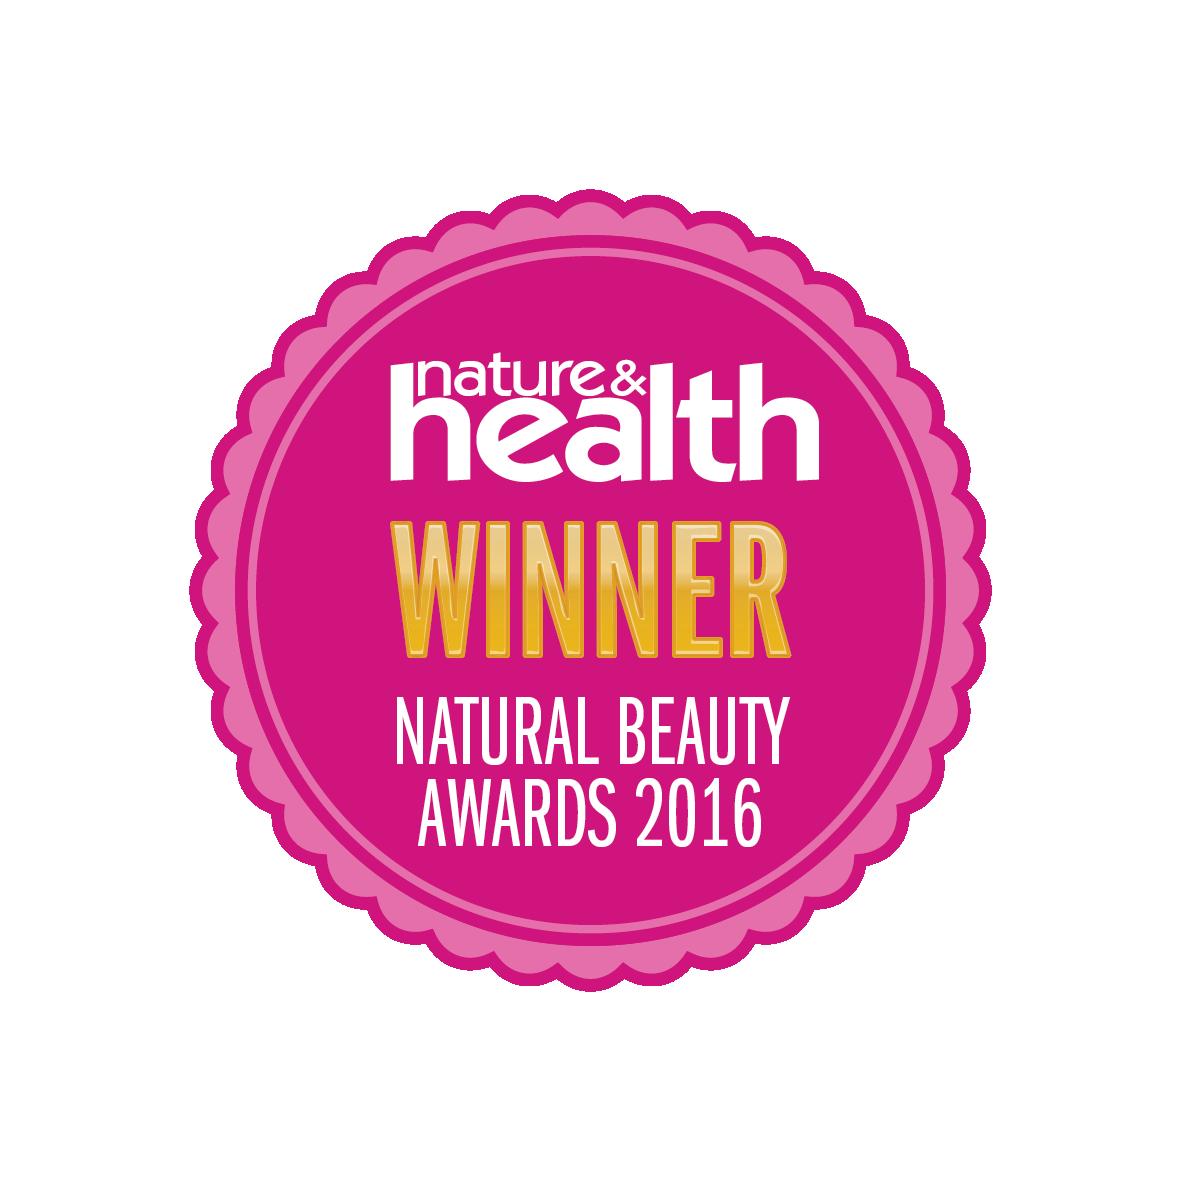 05493-NAH-beauty-awards-winner_EMAIL.png